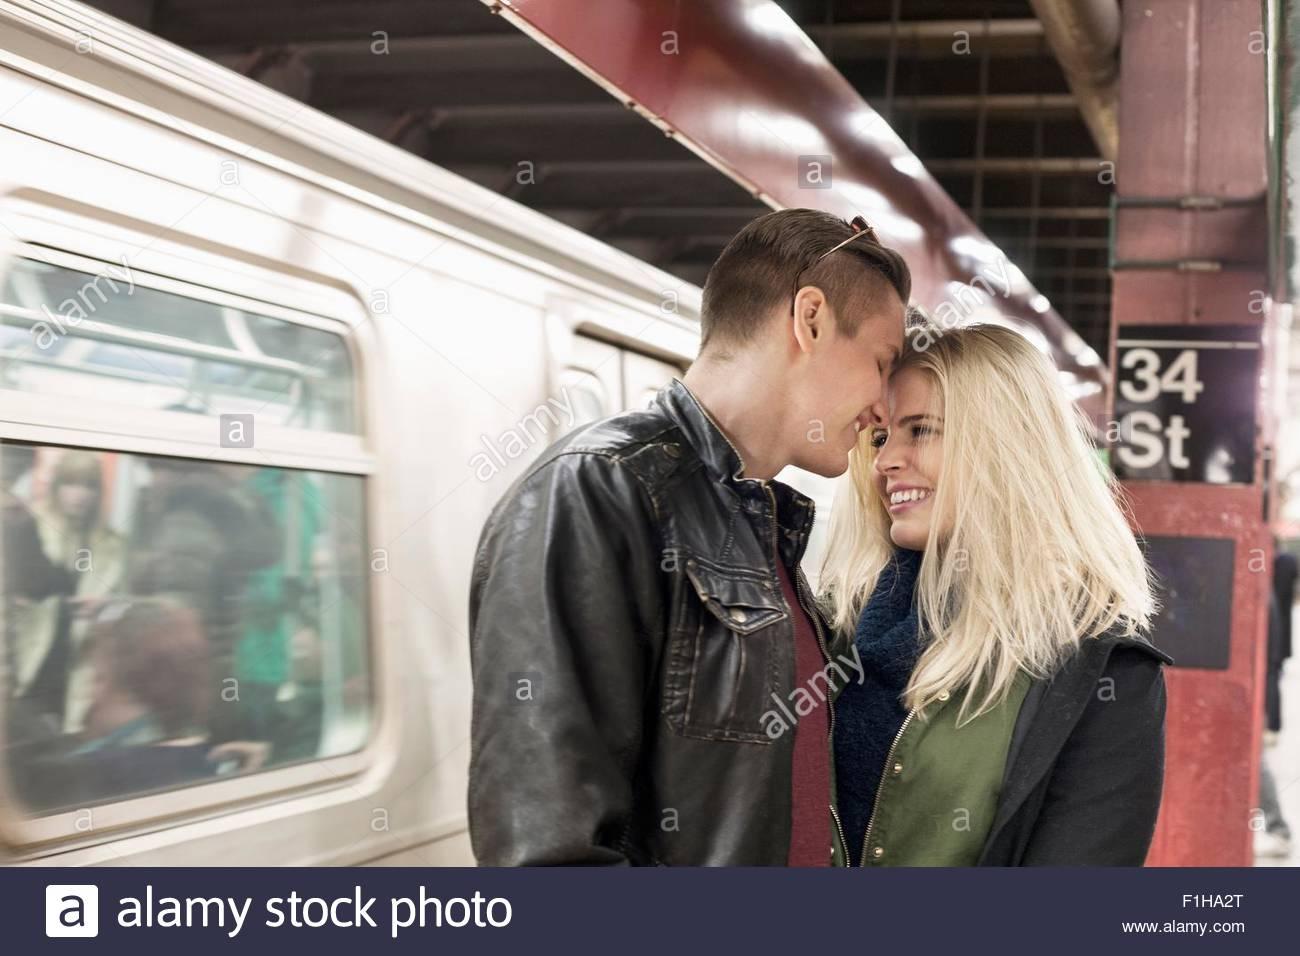 Romantic young couple on New York City subway platform,  New York, USA - Stock Image